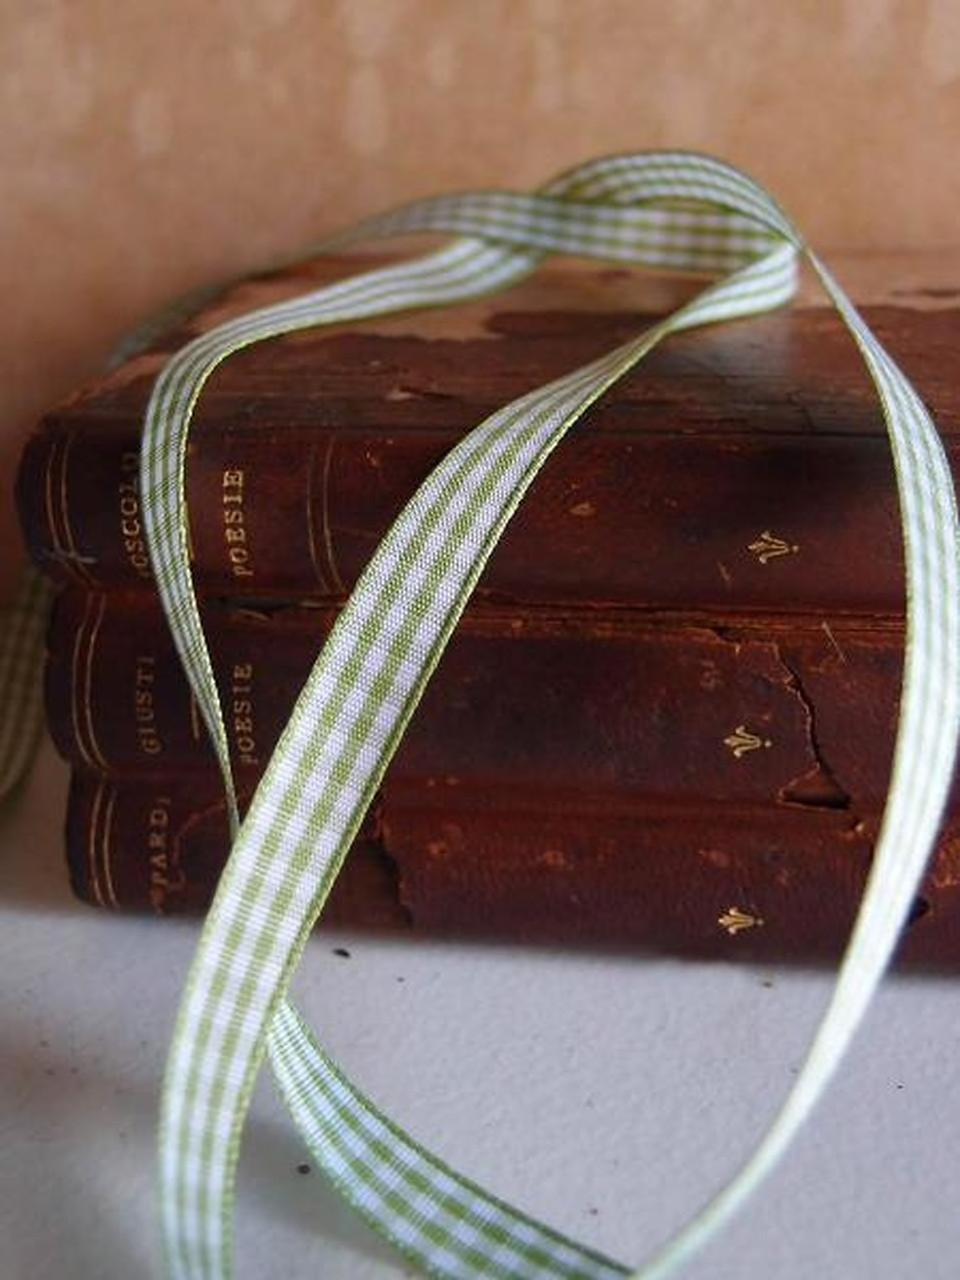 Wholesale Checkered Ribbon, Wholesale Gingham Ribbon, Mint & White Gingham Checkered Ribbon 034-37 | Packaging Decor